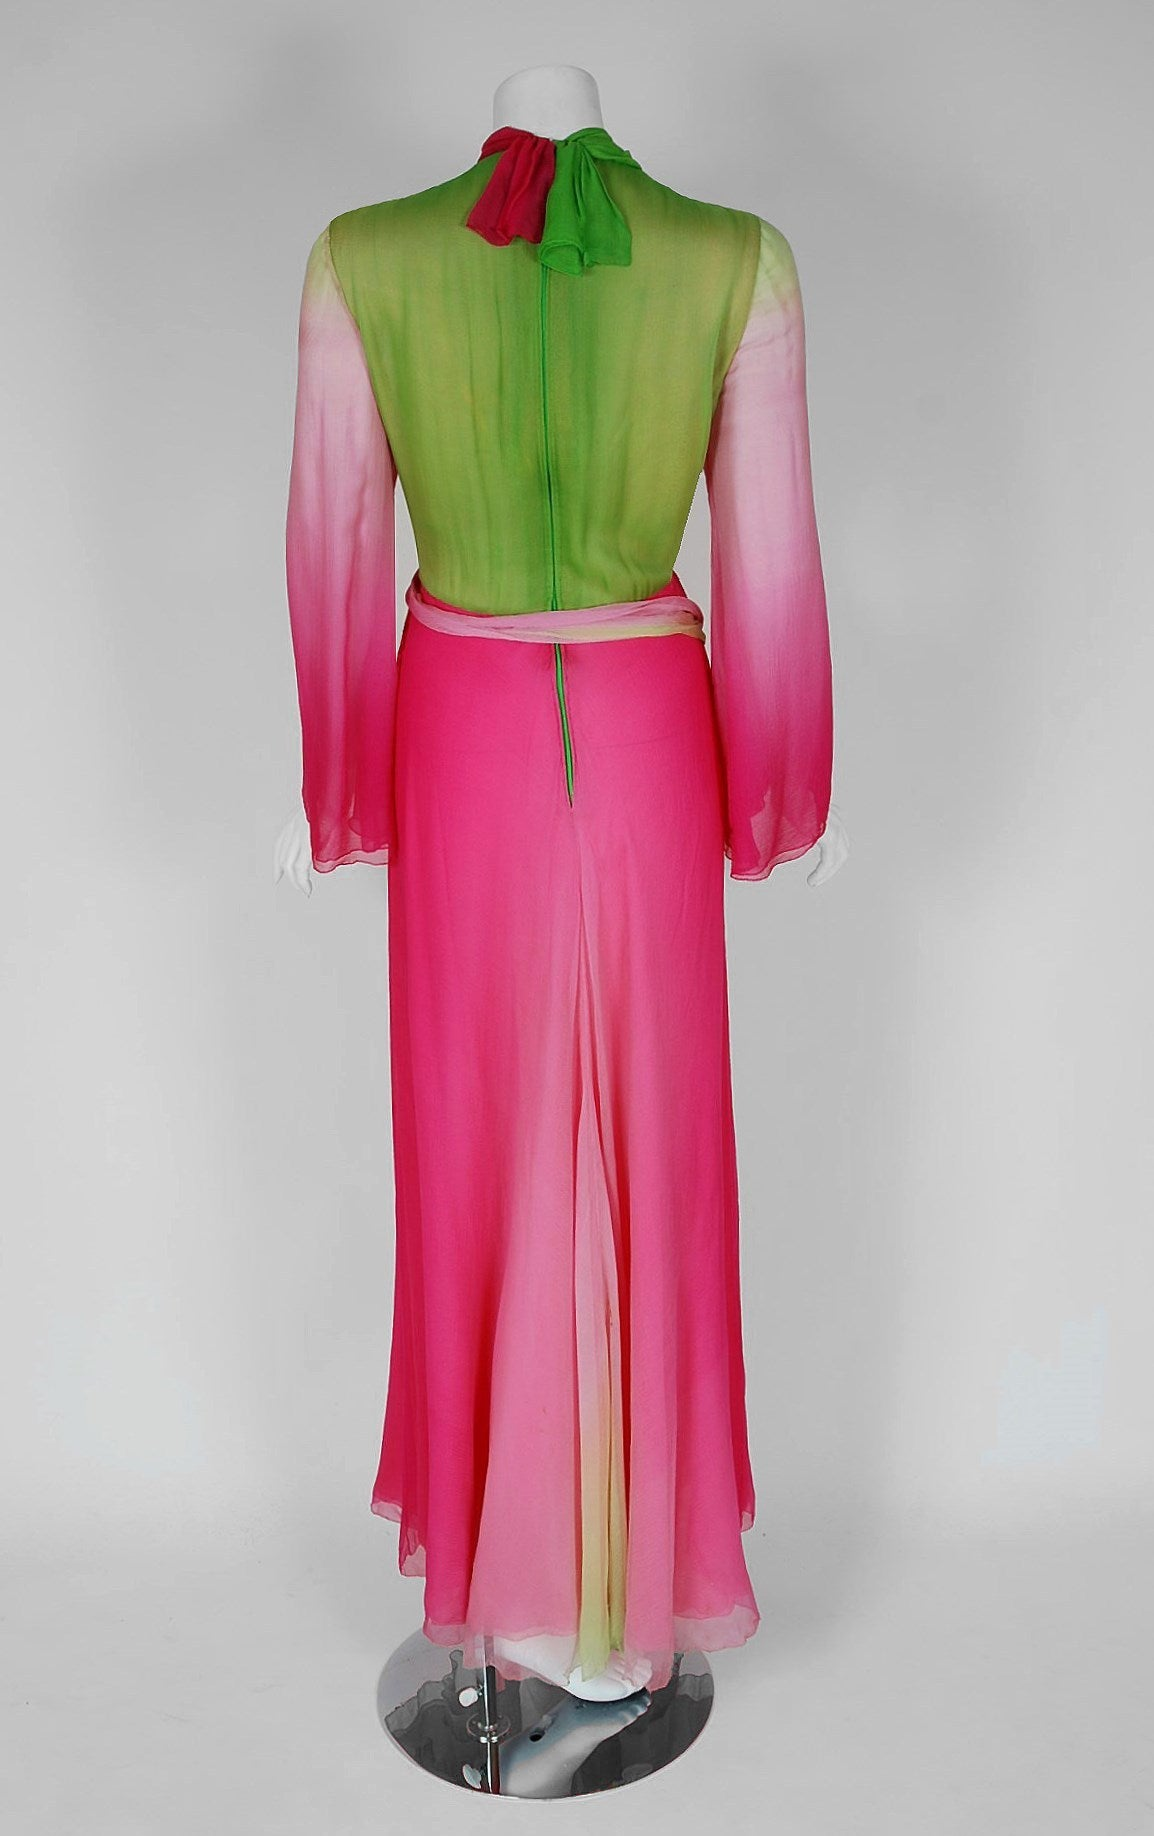 1970's Pauline Trigere Pink & Green Ombre Silk Chiffon Bell-Sleeve Goddess Gown 6